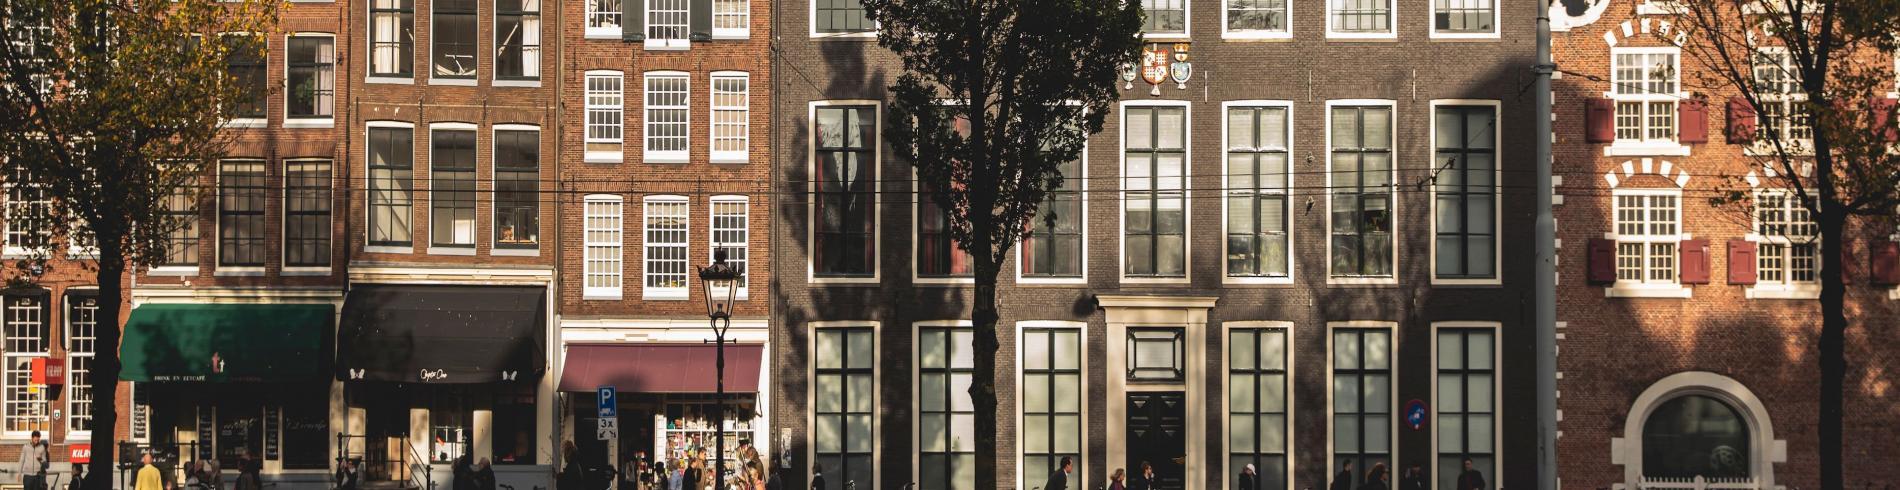 First light in Amsterdam